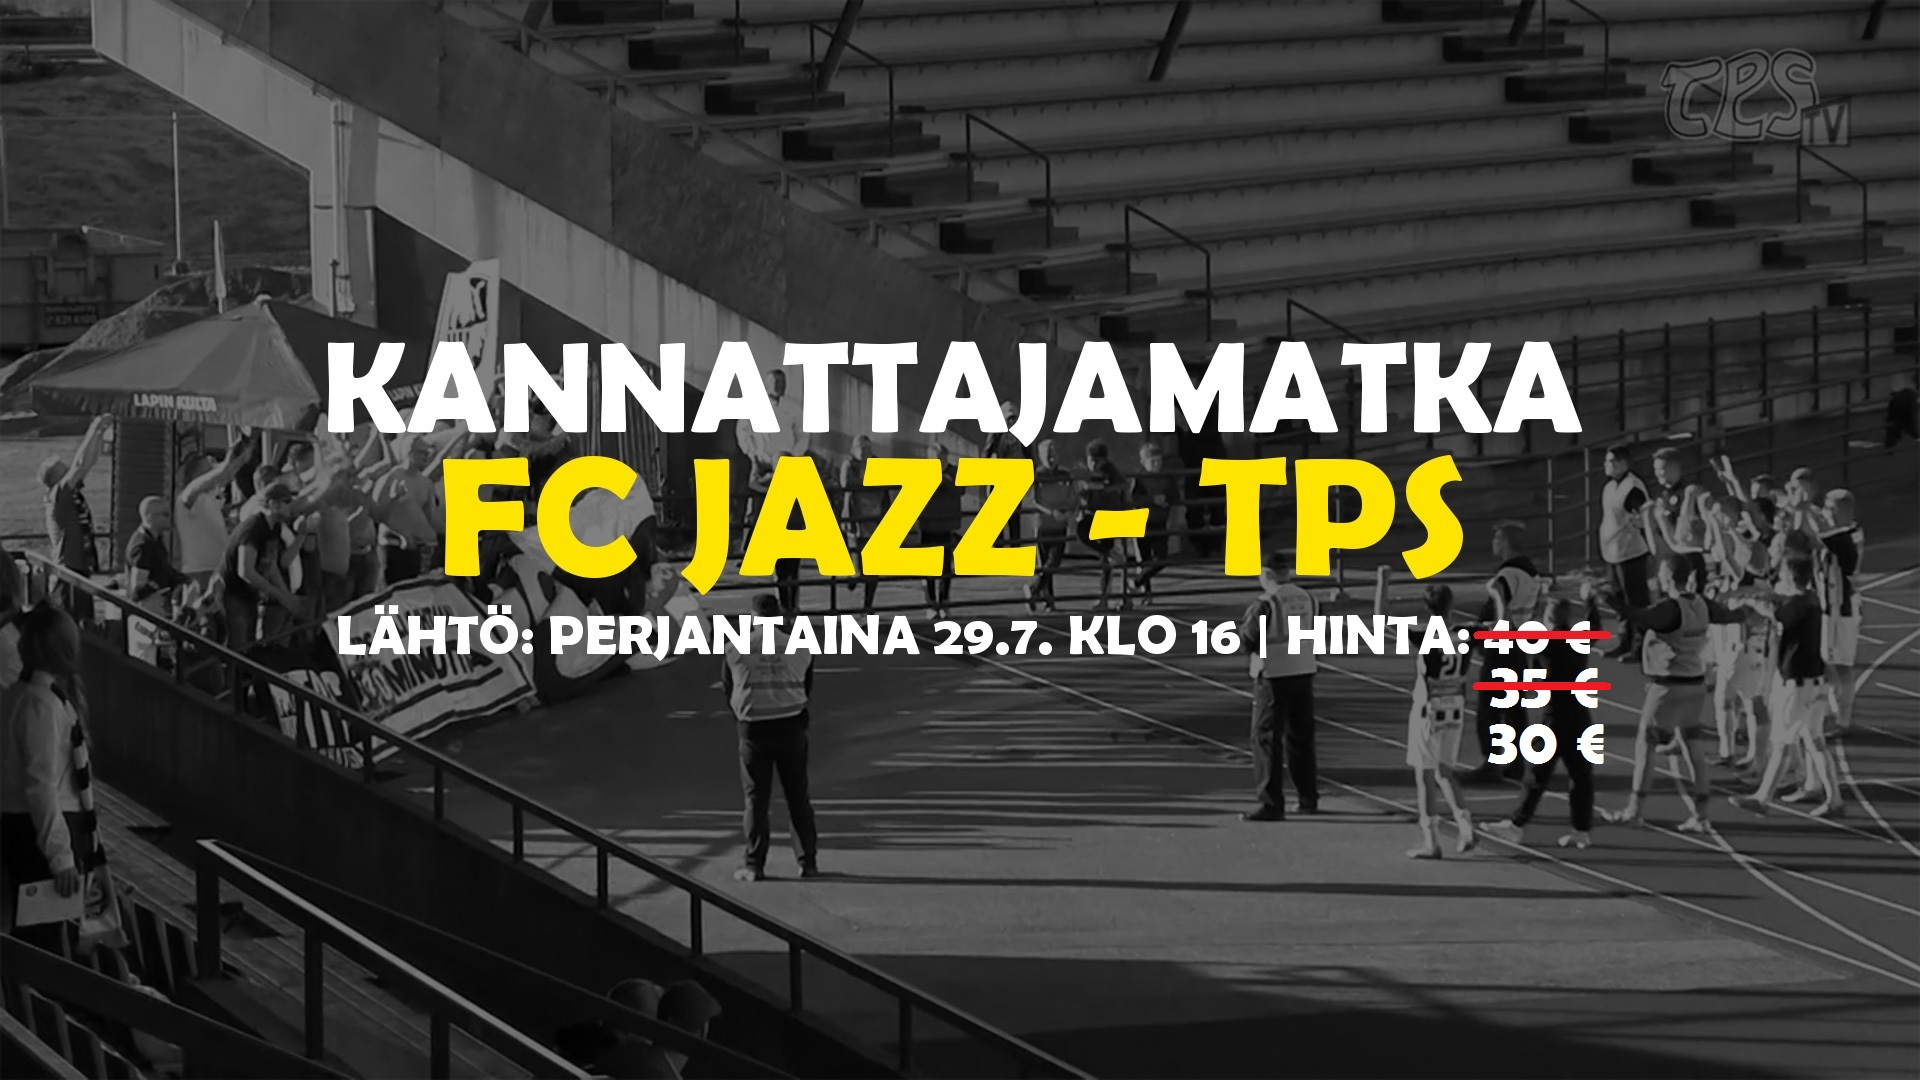 Kannattajamatka: FC Jazz – TPS perjantaina 29.7.